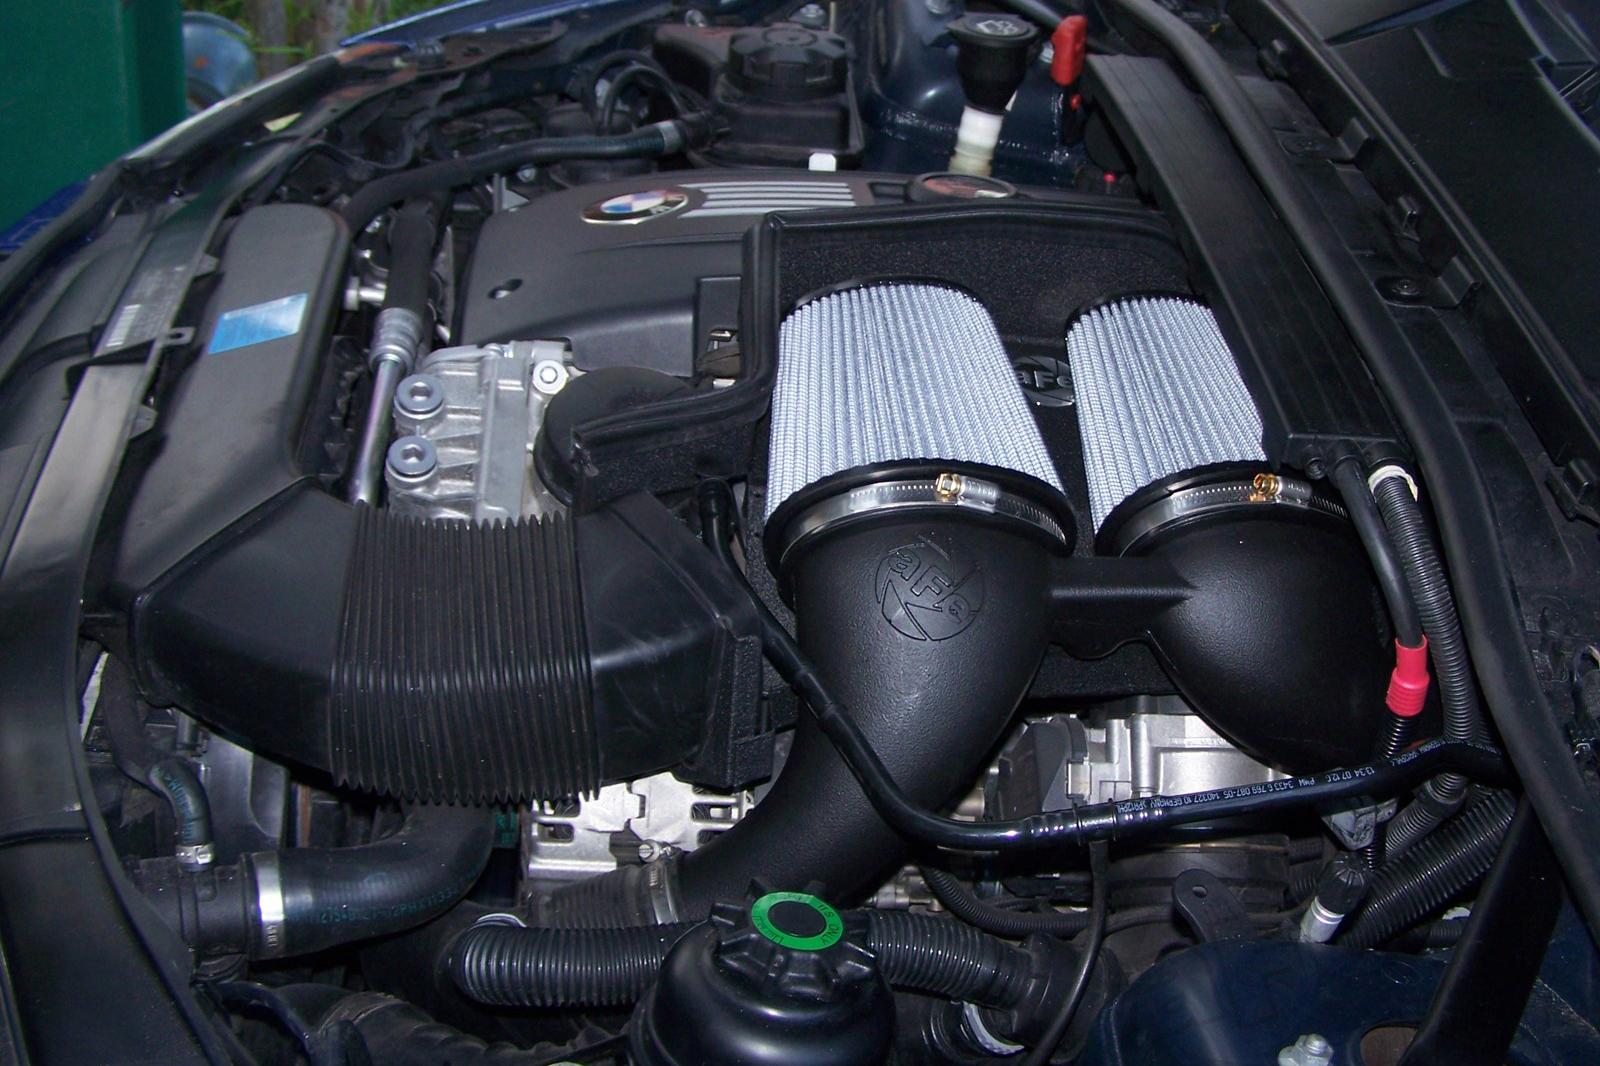 aFe Magnum FORCE Stage 2 Si Air Intake for 2006-10 BMW 135i/1M/335i/535i/Z4 N54 [E82/E90/E92/E60] 2